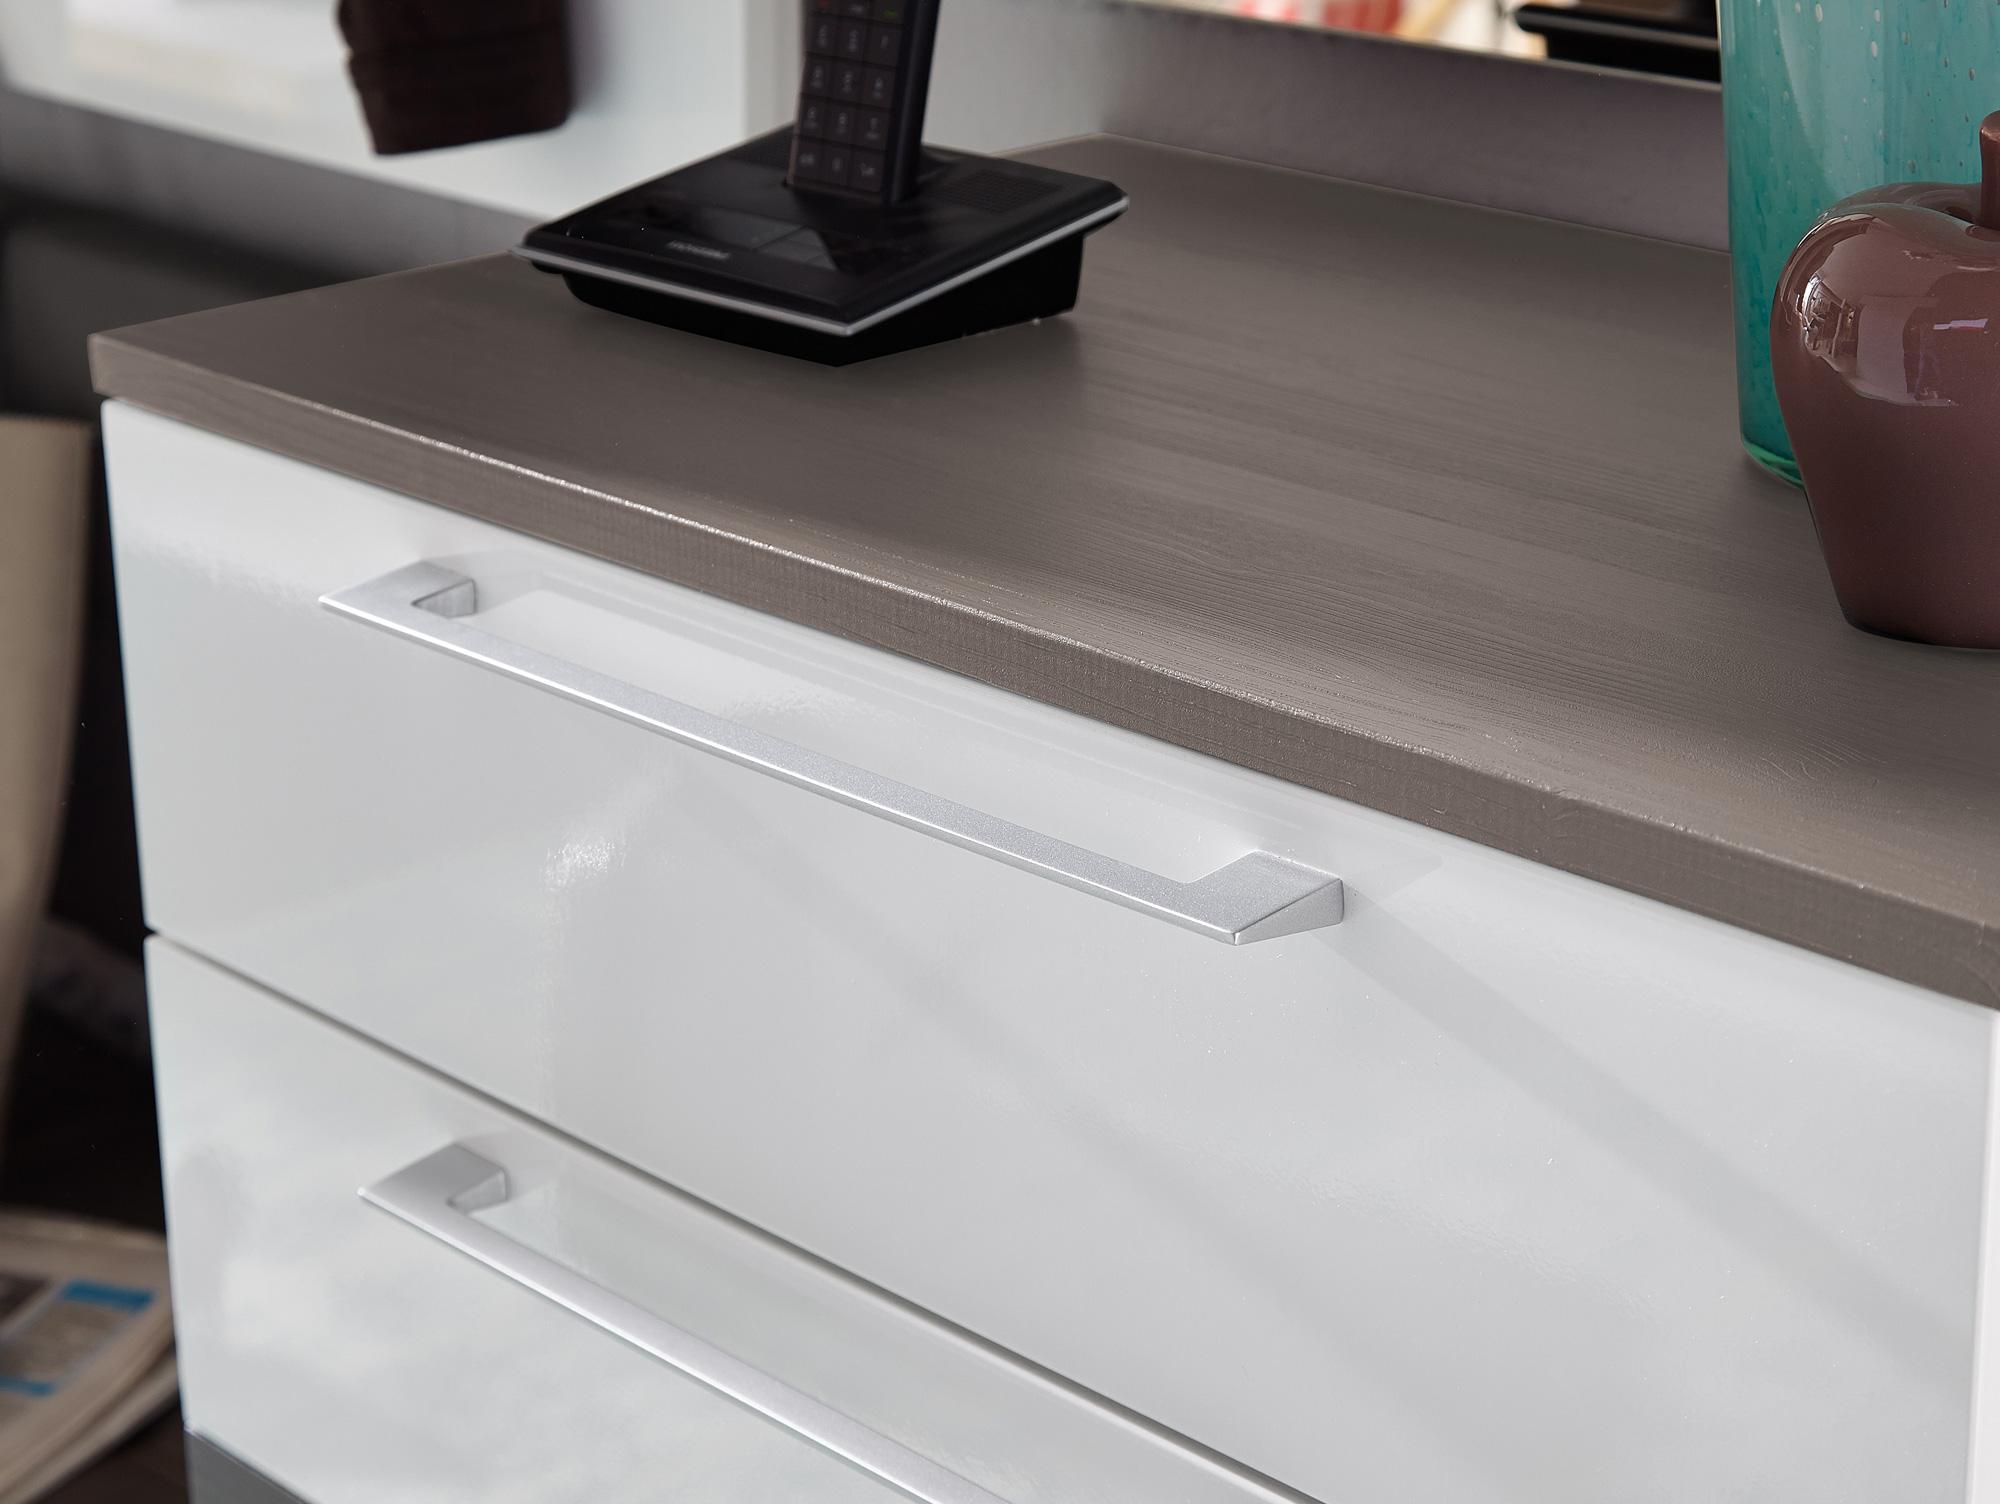 rene garderoben kombination weiss hochglanz weiss hg grau. Black Bedroom Furniture Sets. Home Design Ideas